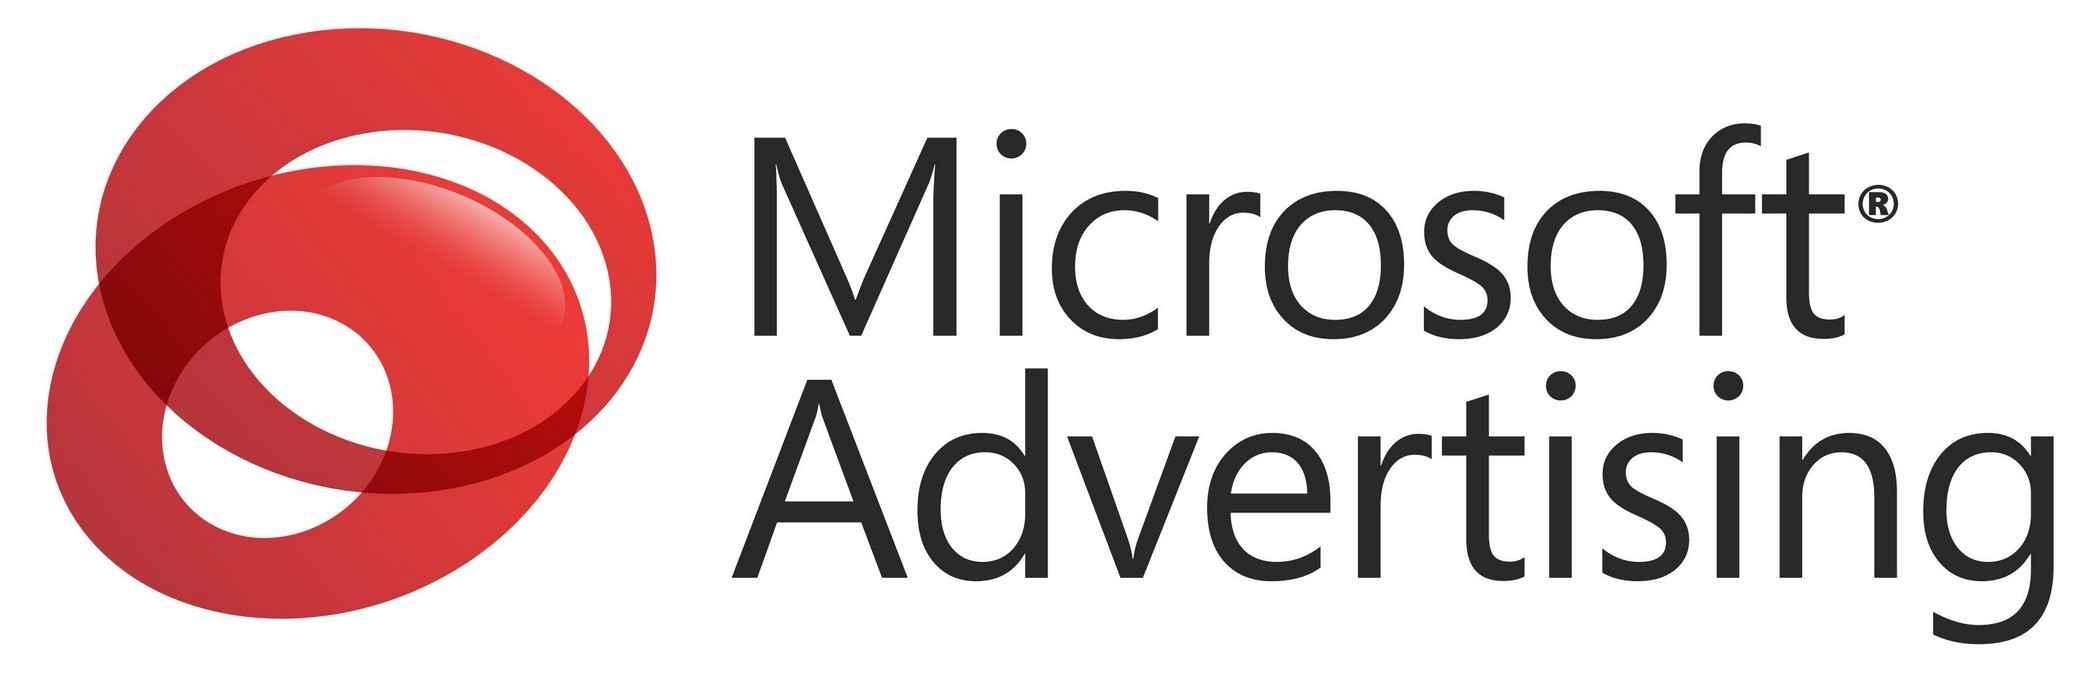 microsoft advertising logo vector